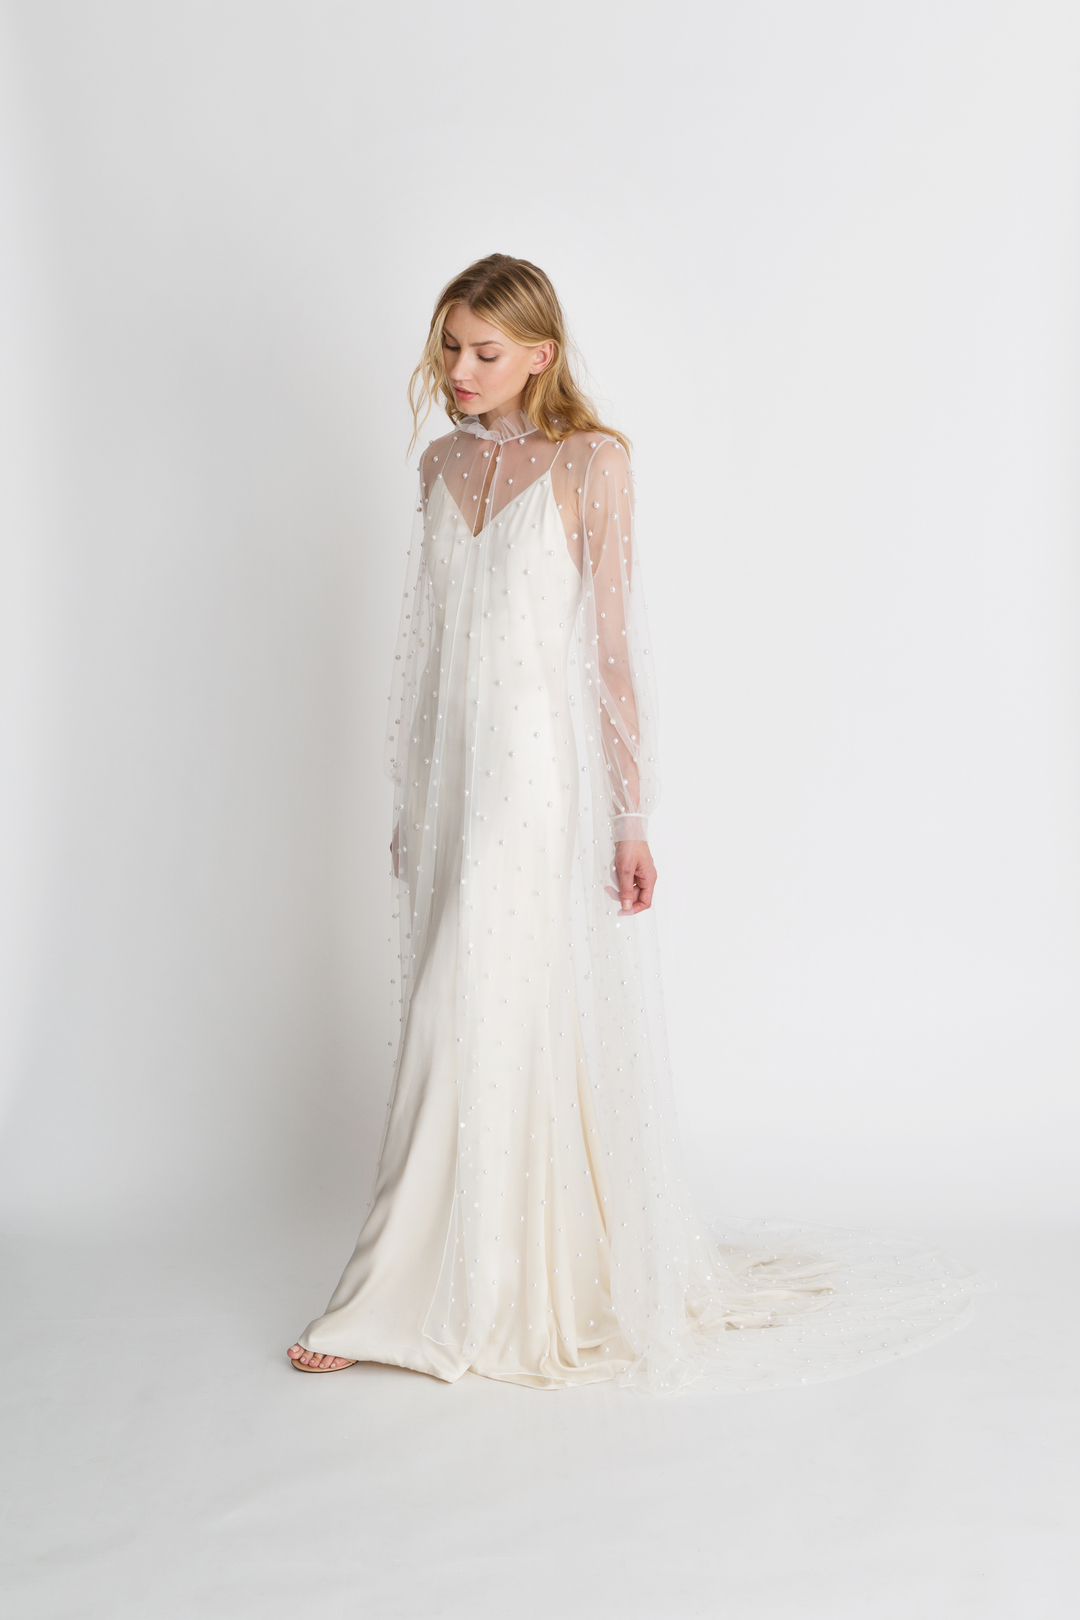 Dress main 2x 1543693808